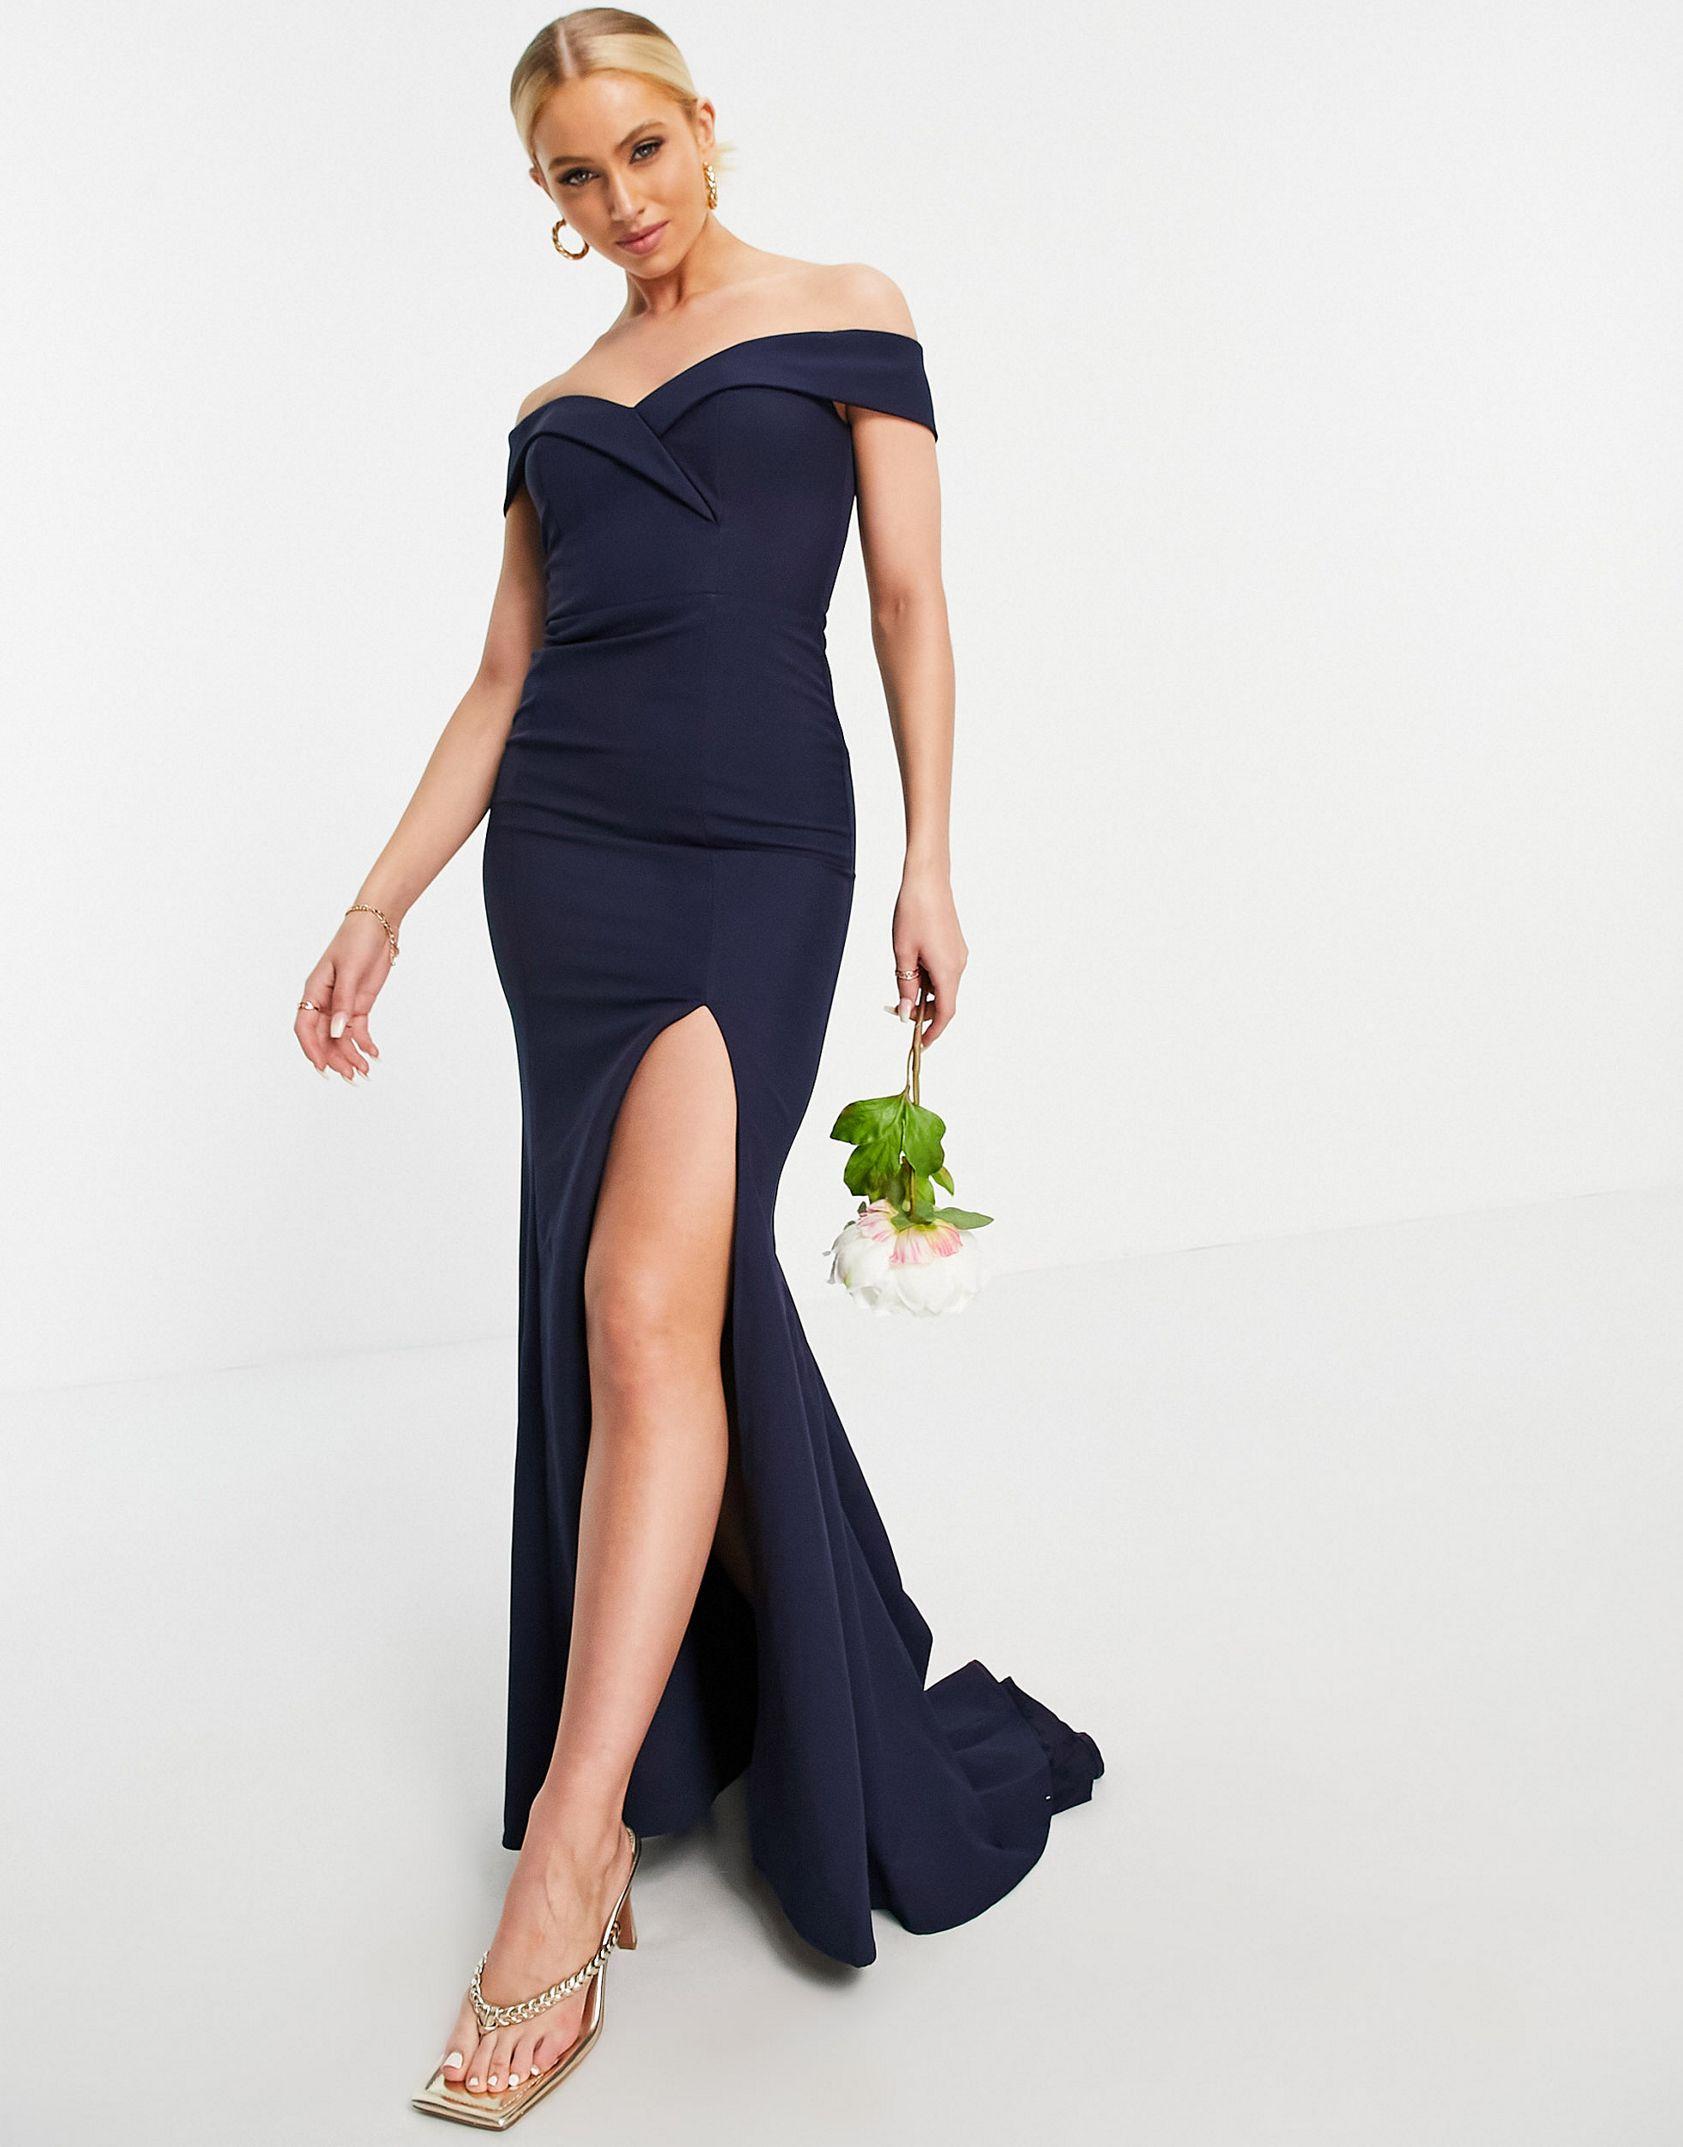 Jarlo bardot maxi dress with thigh split in navy -  Price Checker